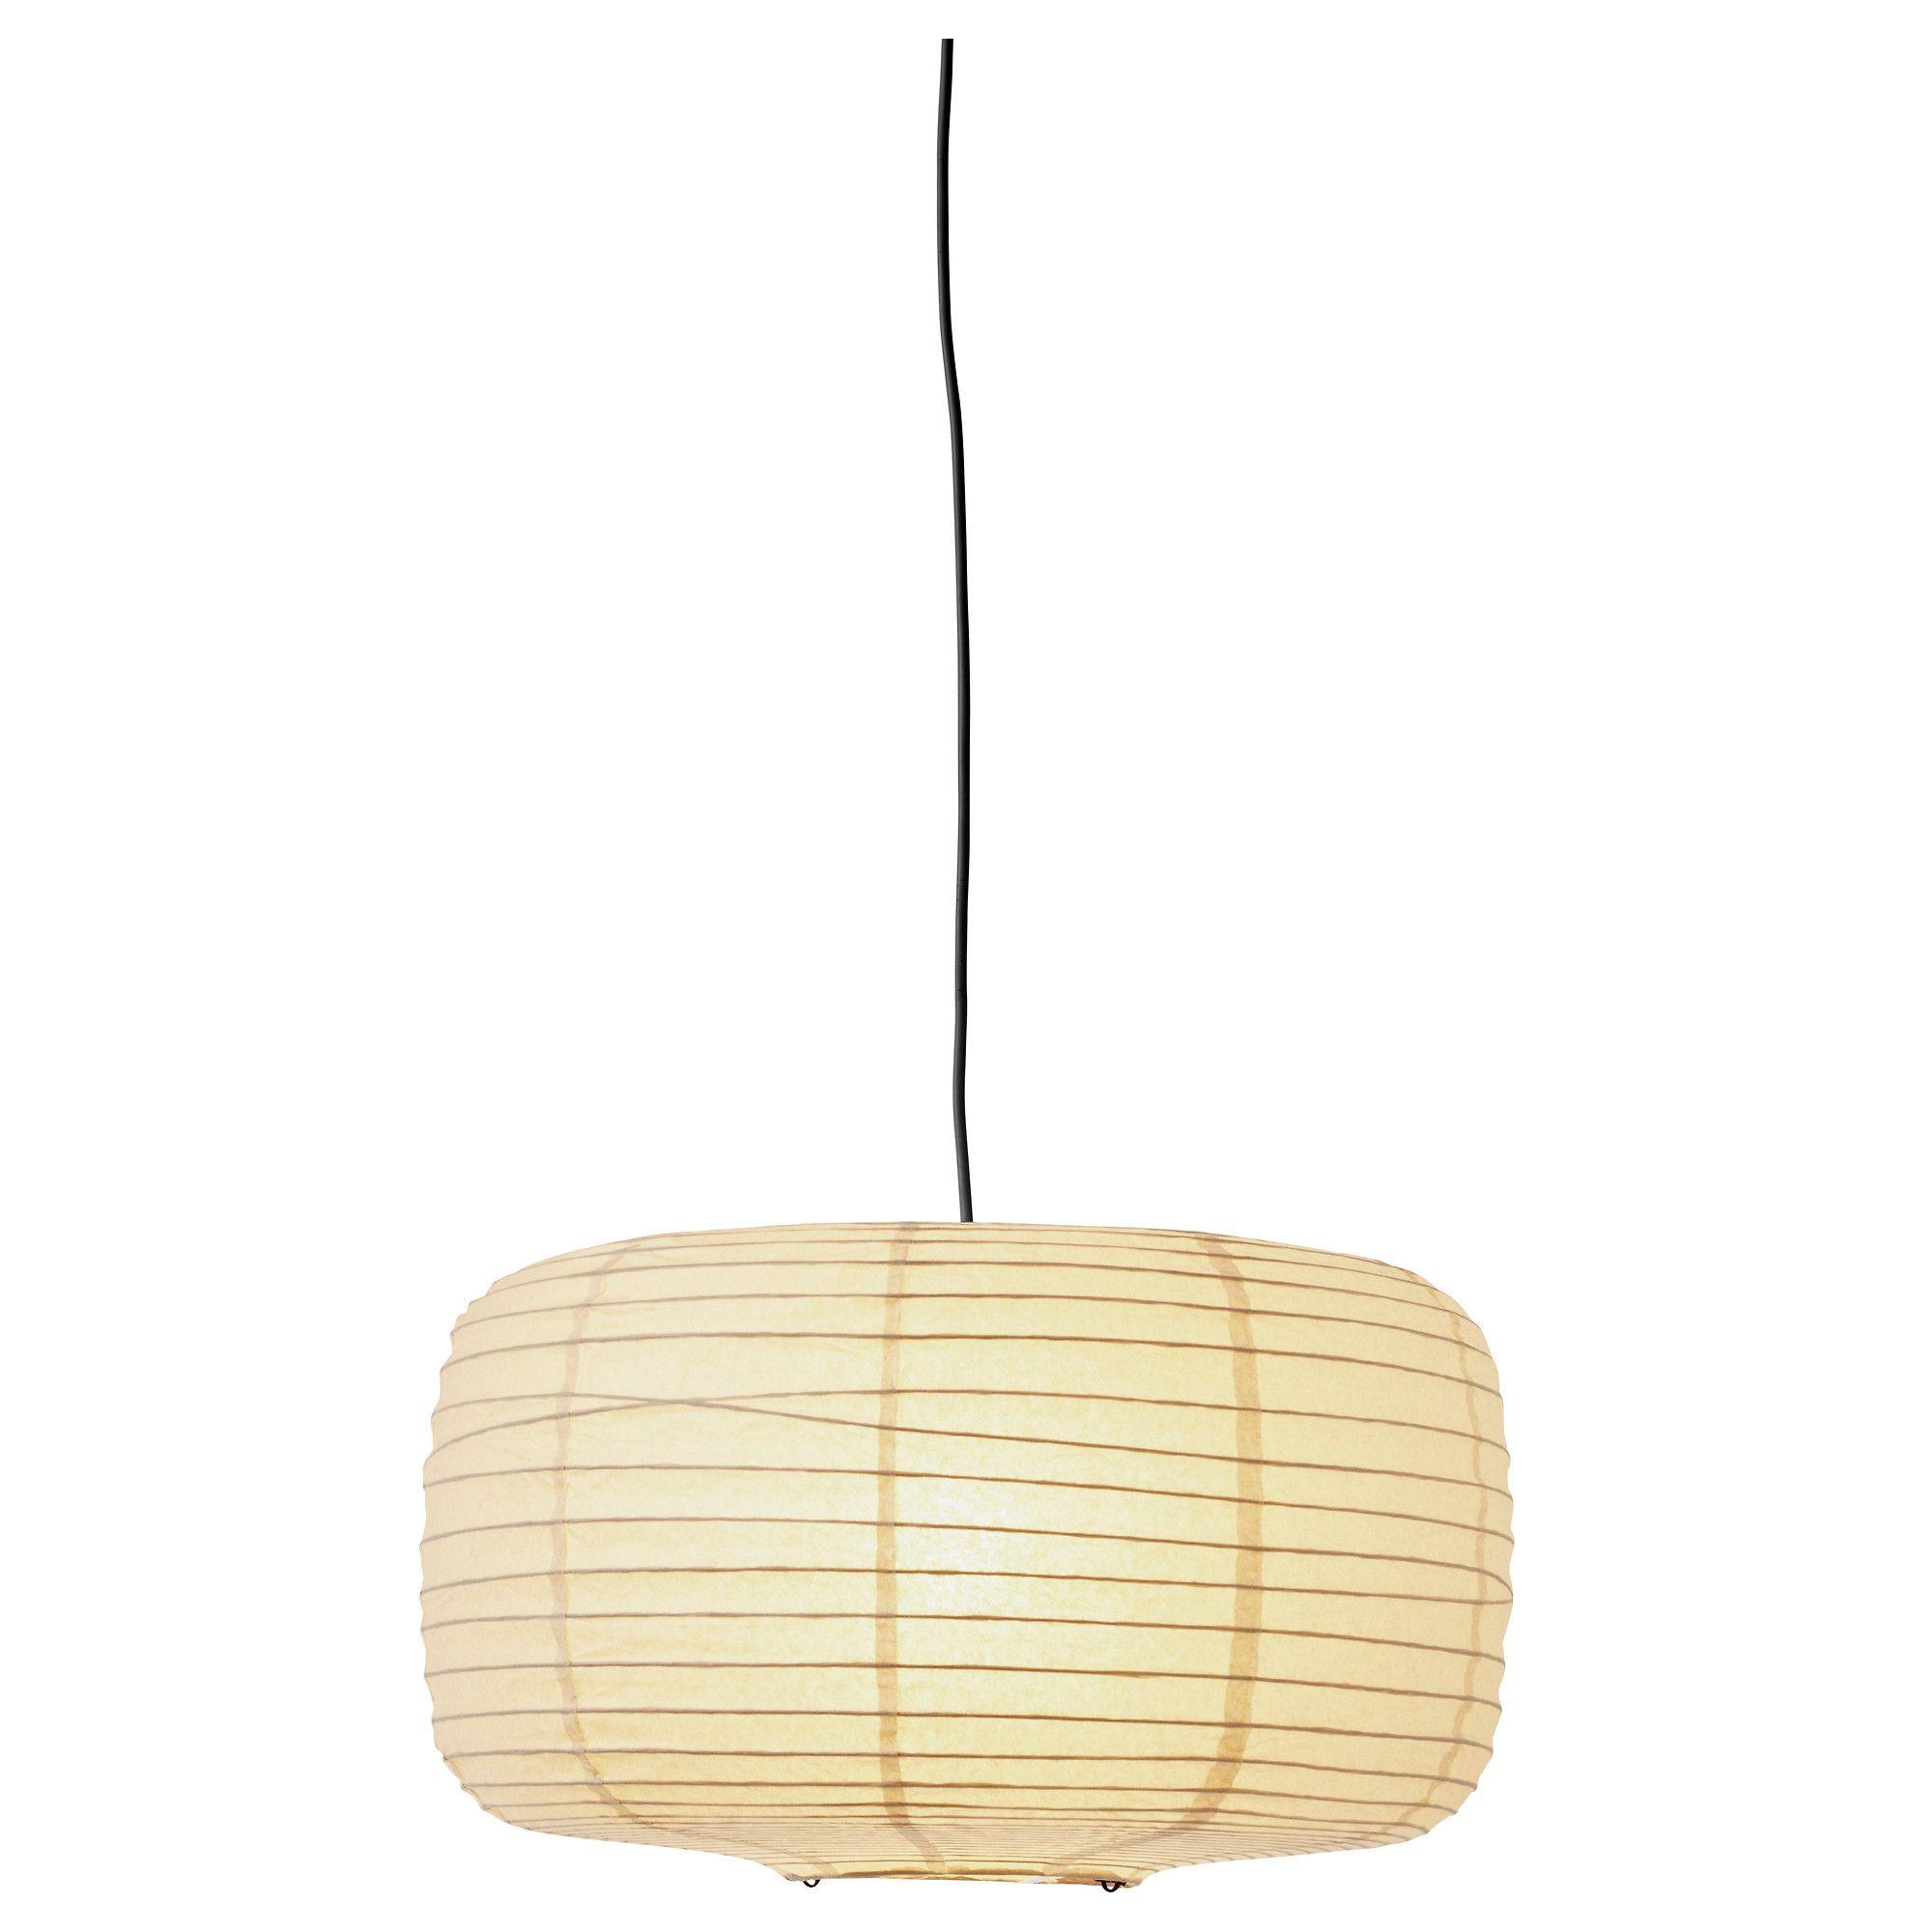 Ikea Us Furniture And Home Furnishings Pendant Lamp Shade Lamp Lamp Shade